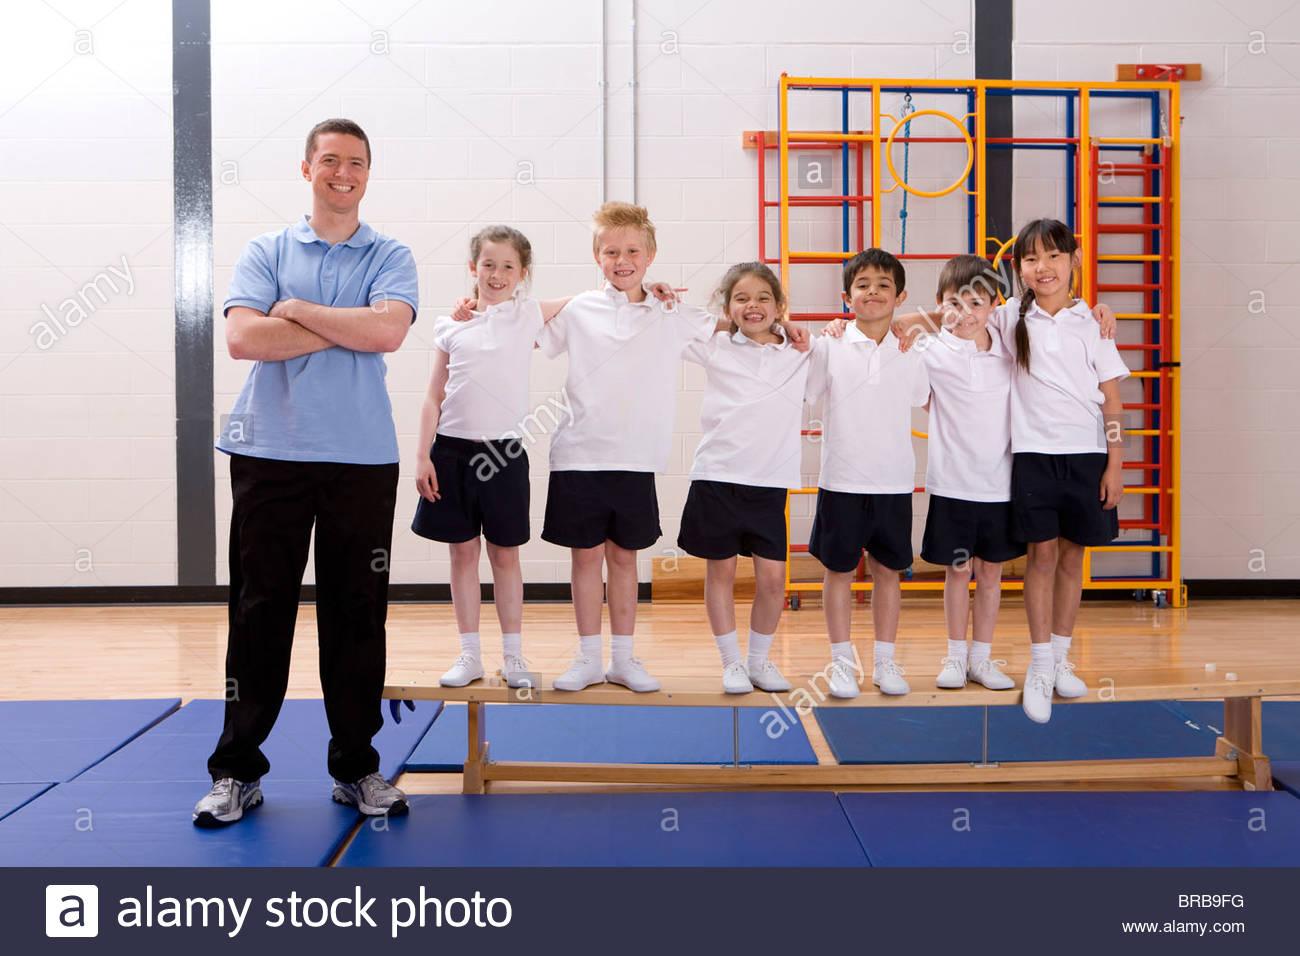 Smiling gym teacher and school children in